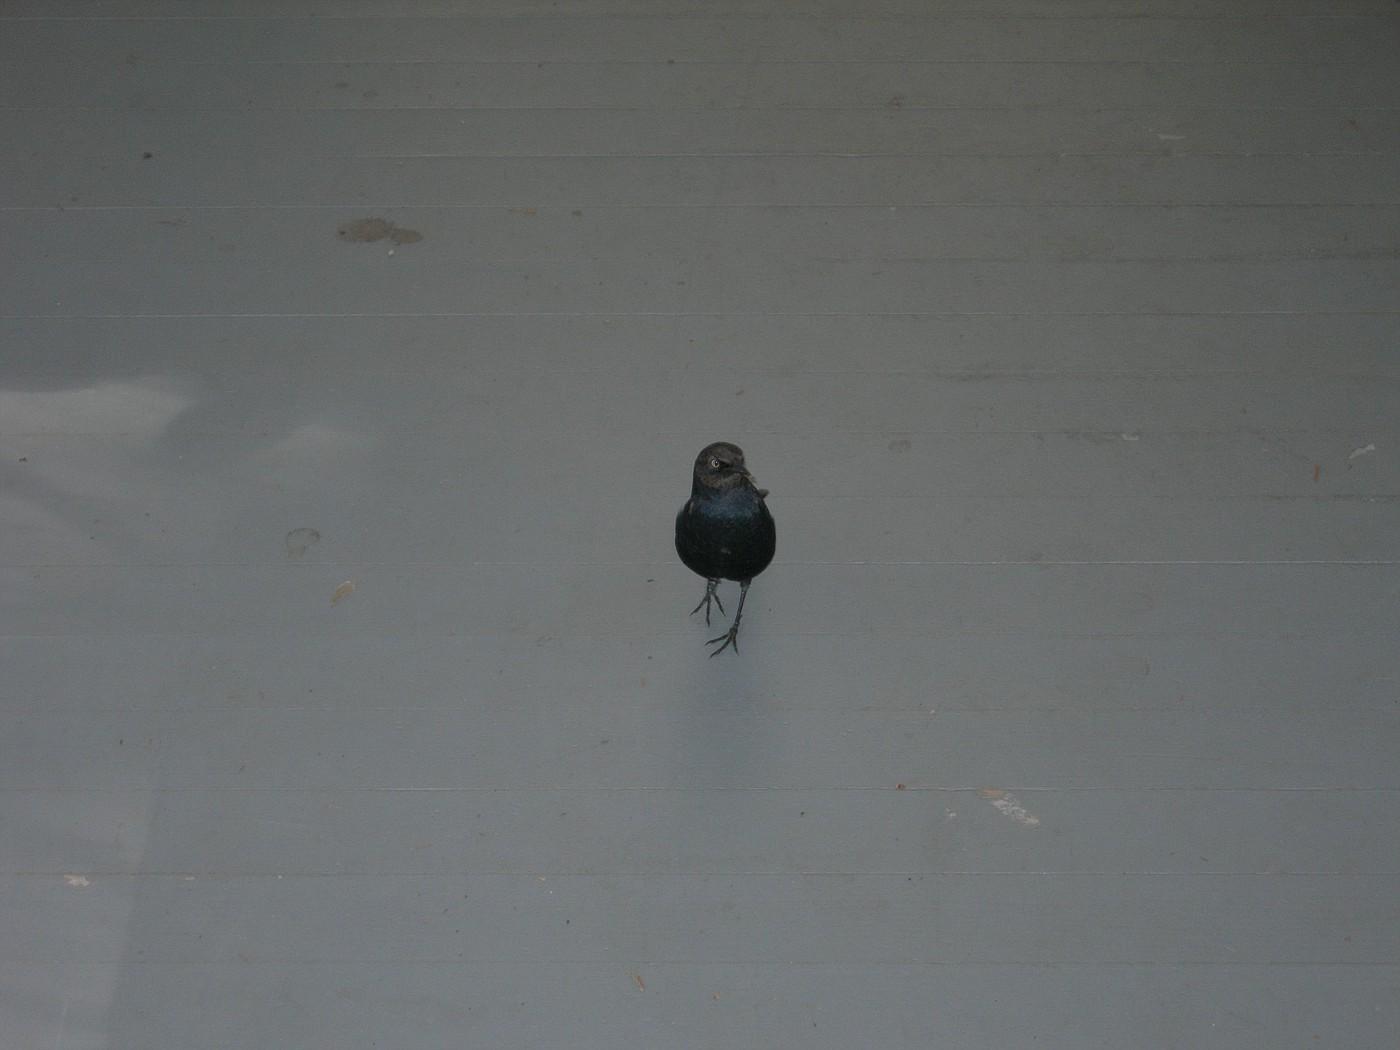 Wawona Visitor